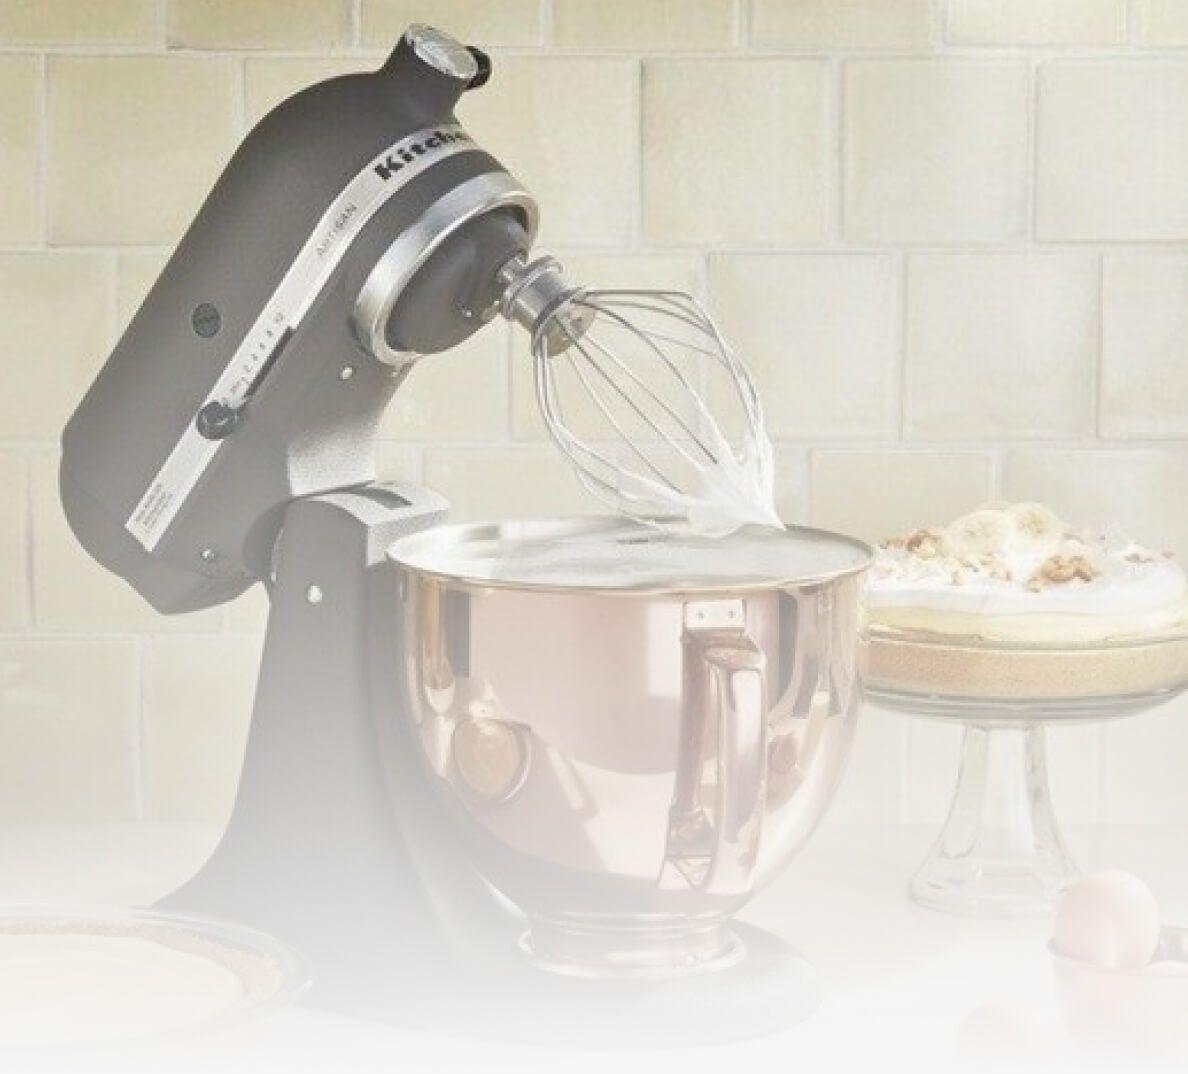 A KitchenAid® Matte Black Stand Mixer with a copper bowl.